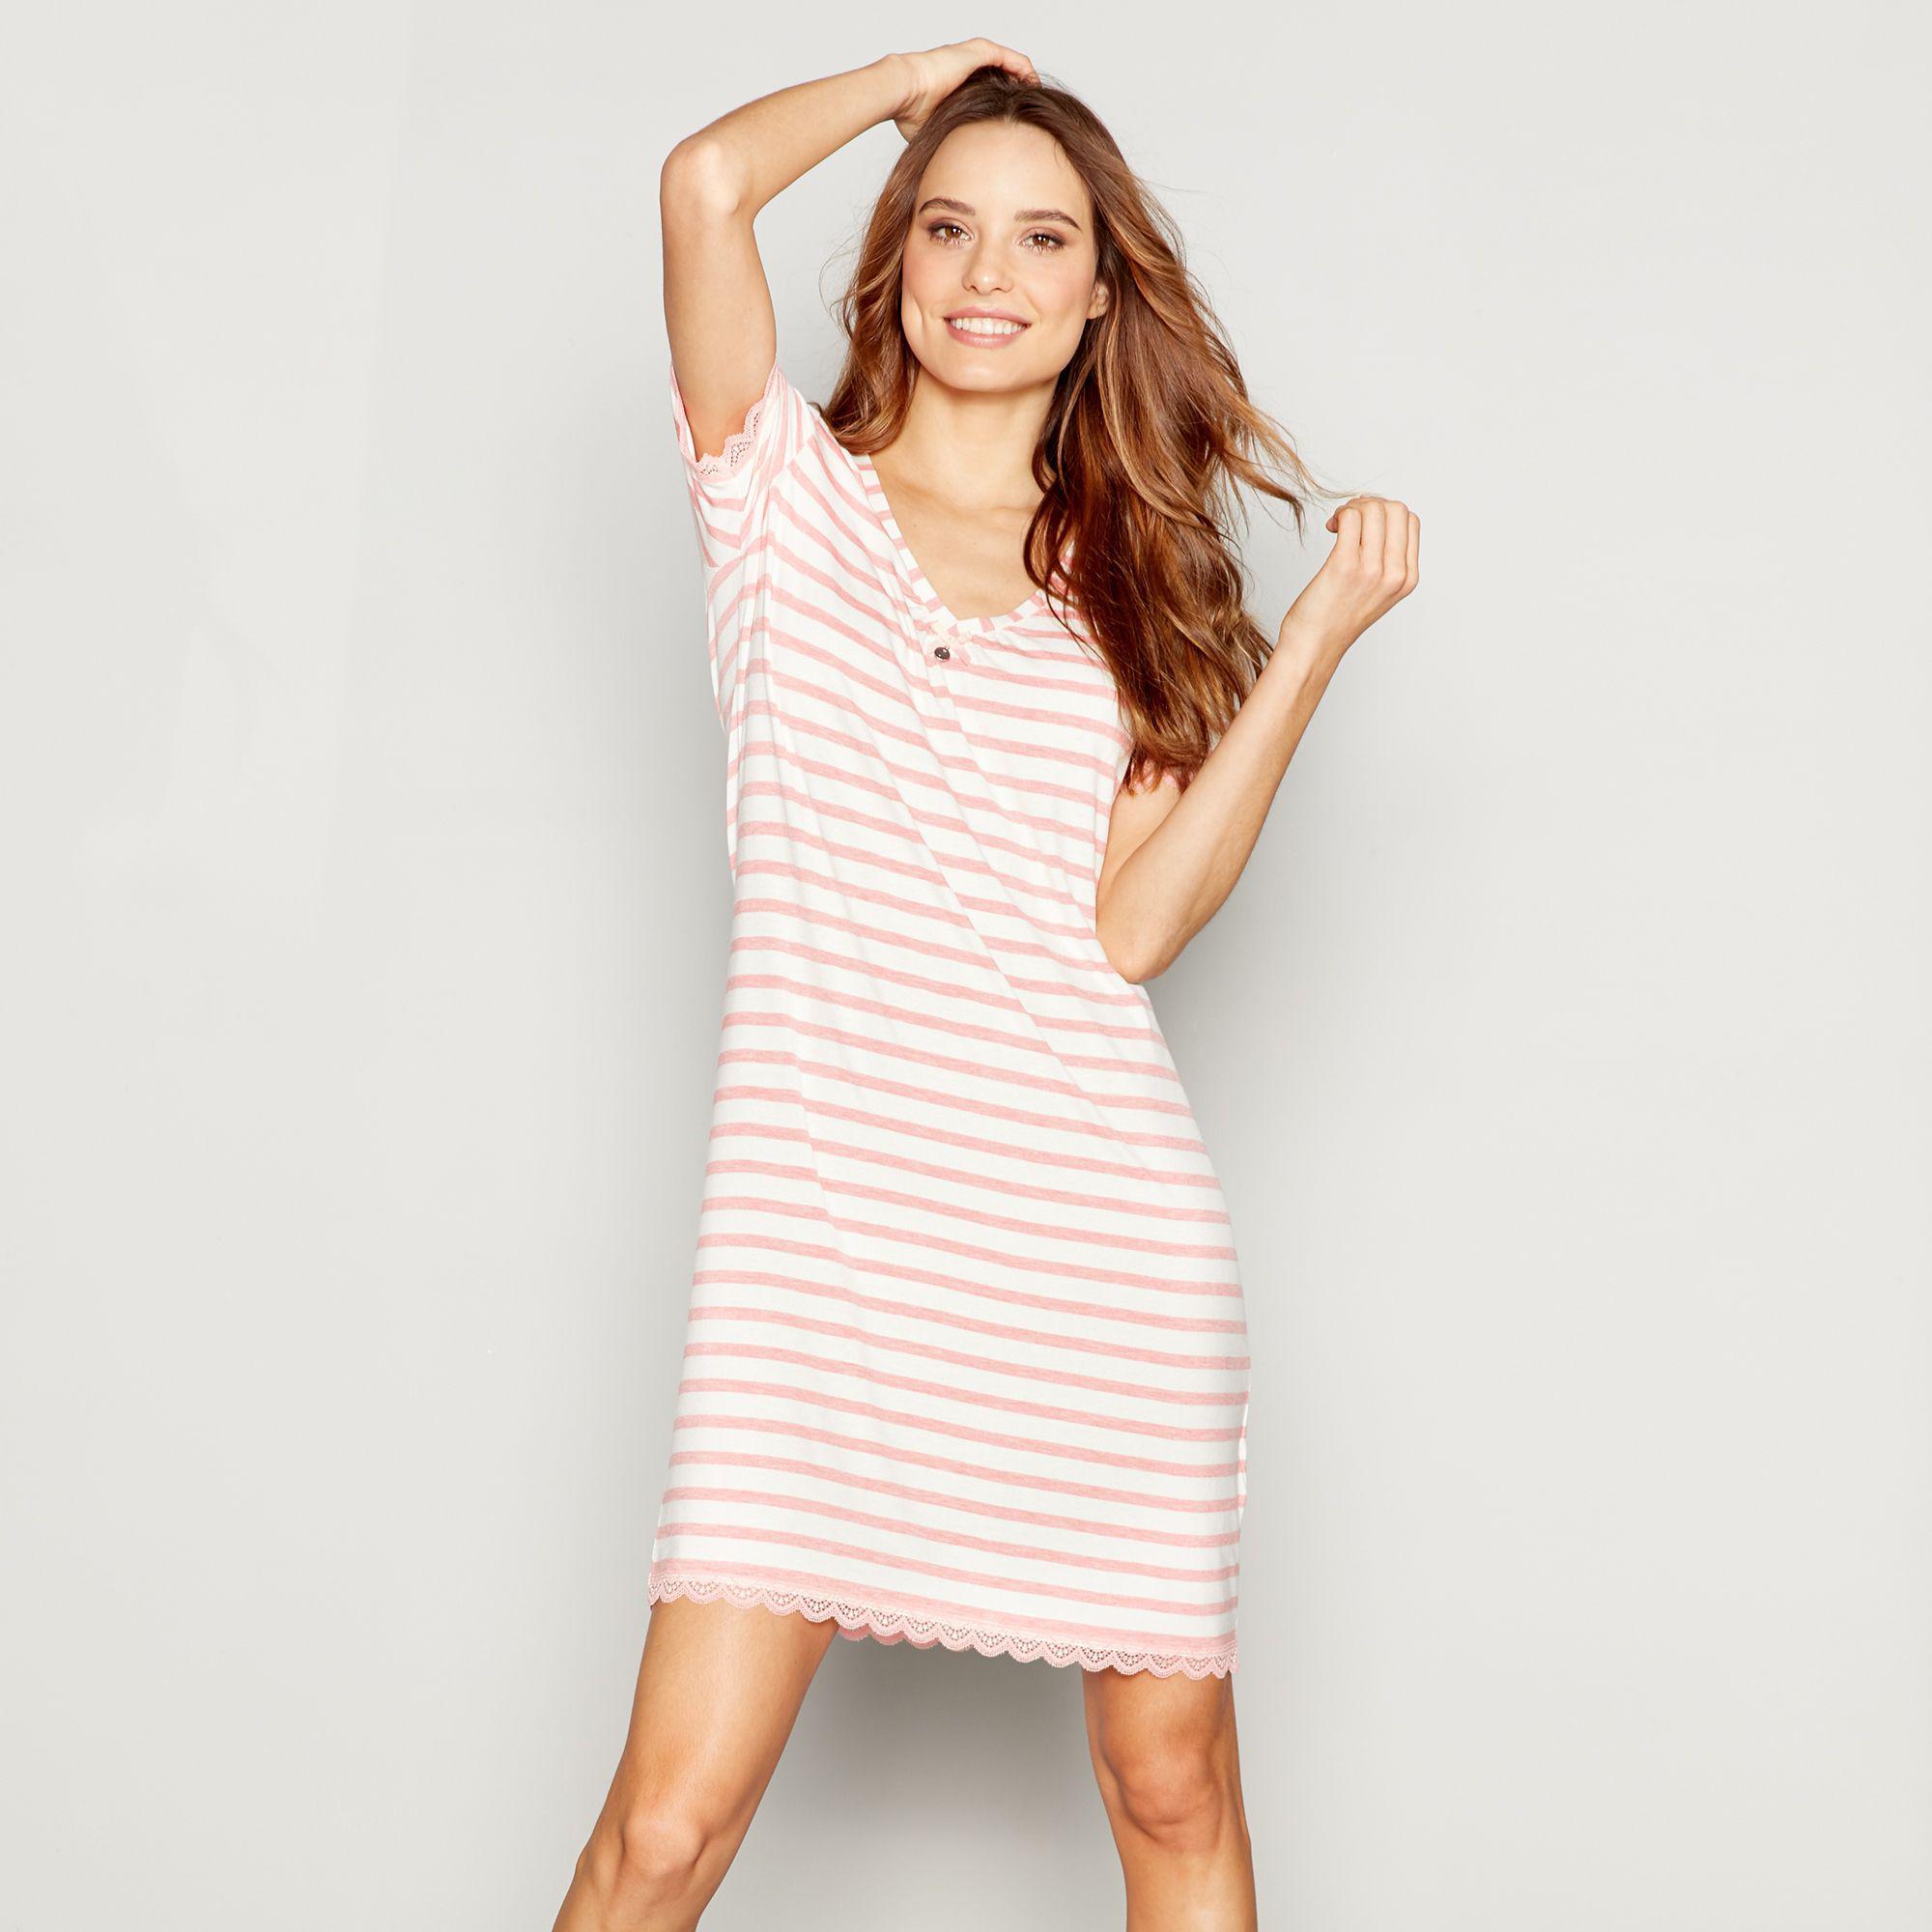 5d89eff4ee6 J By Jasper Conran Pink Stripe Print Jersey  nomad  Nightdress in ...